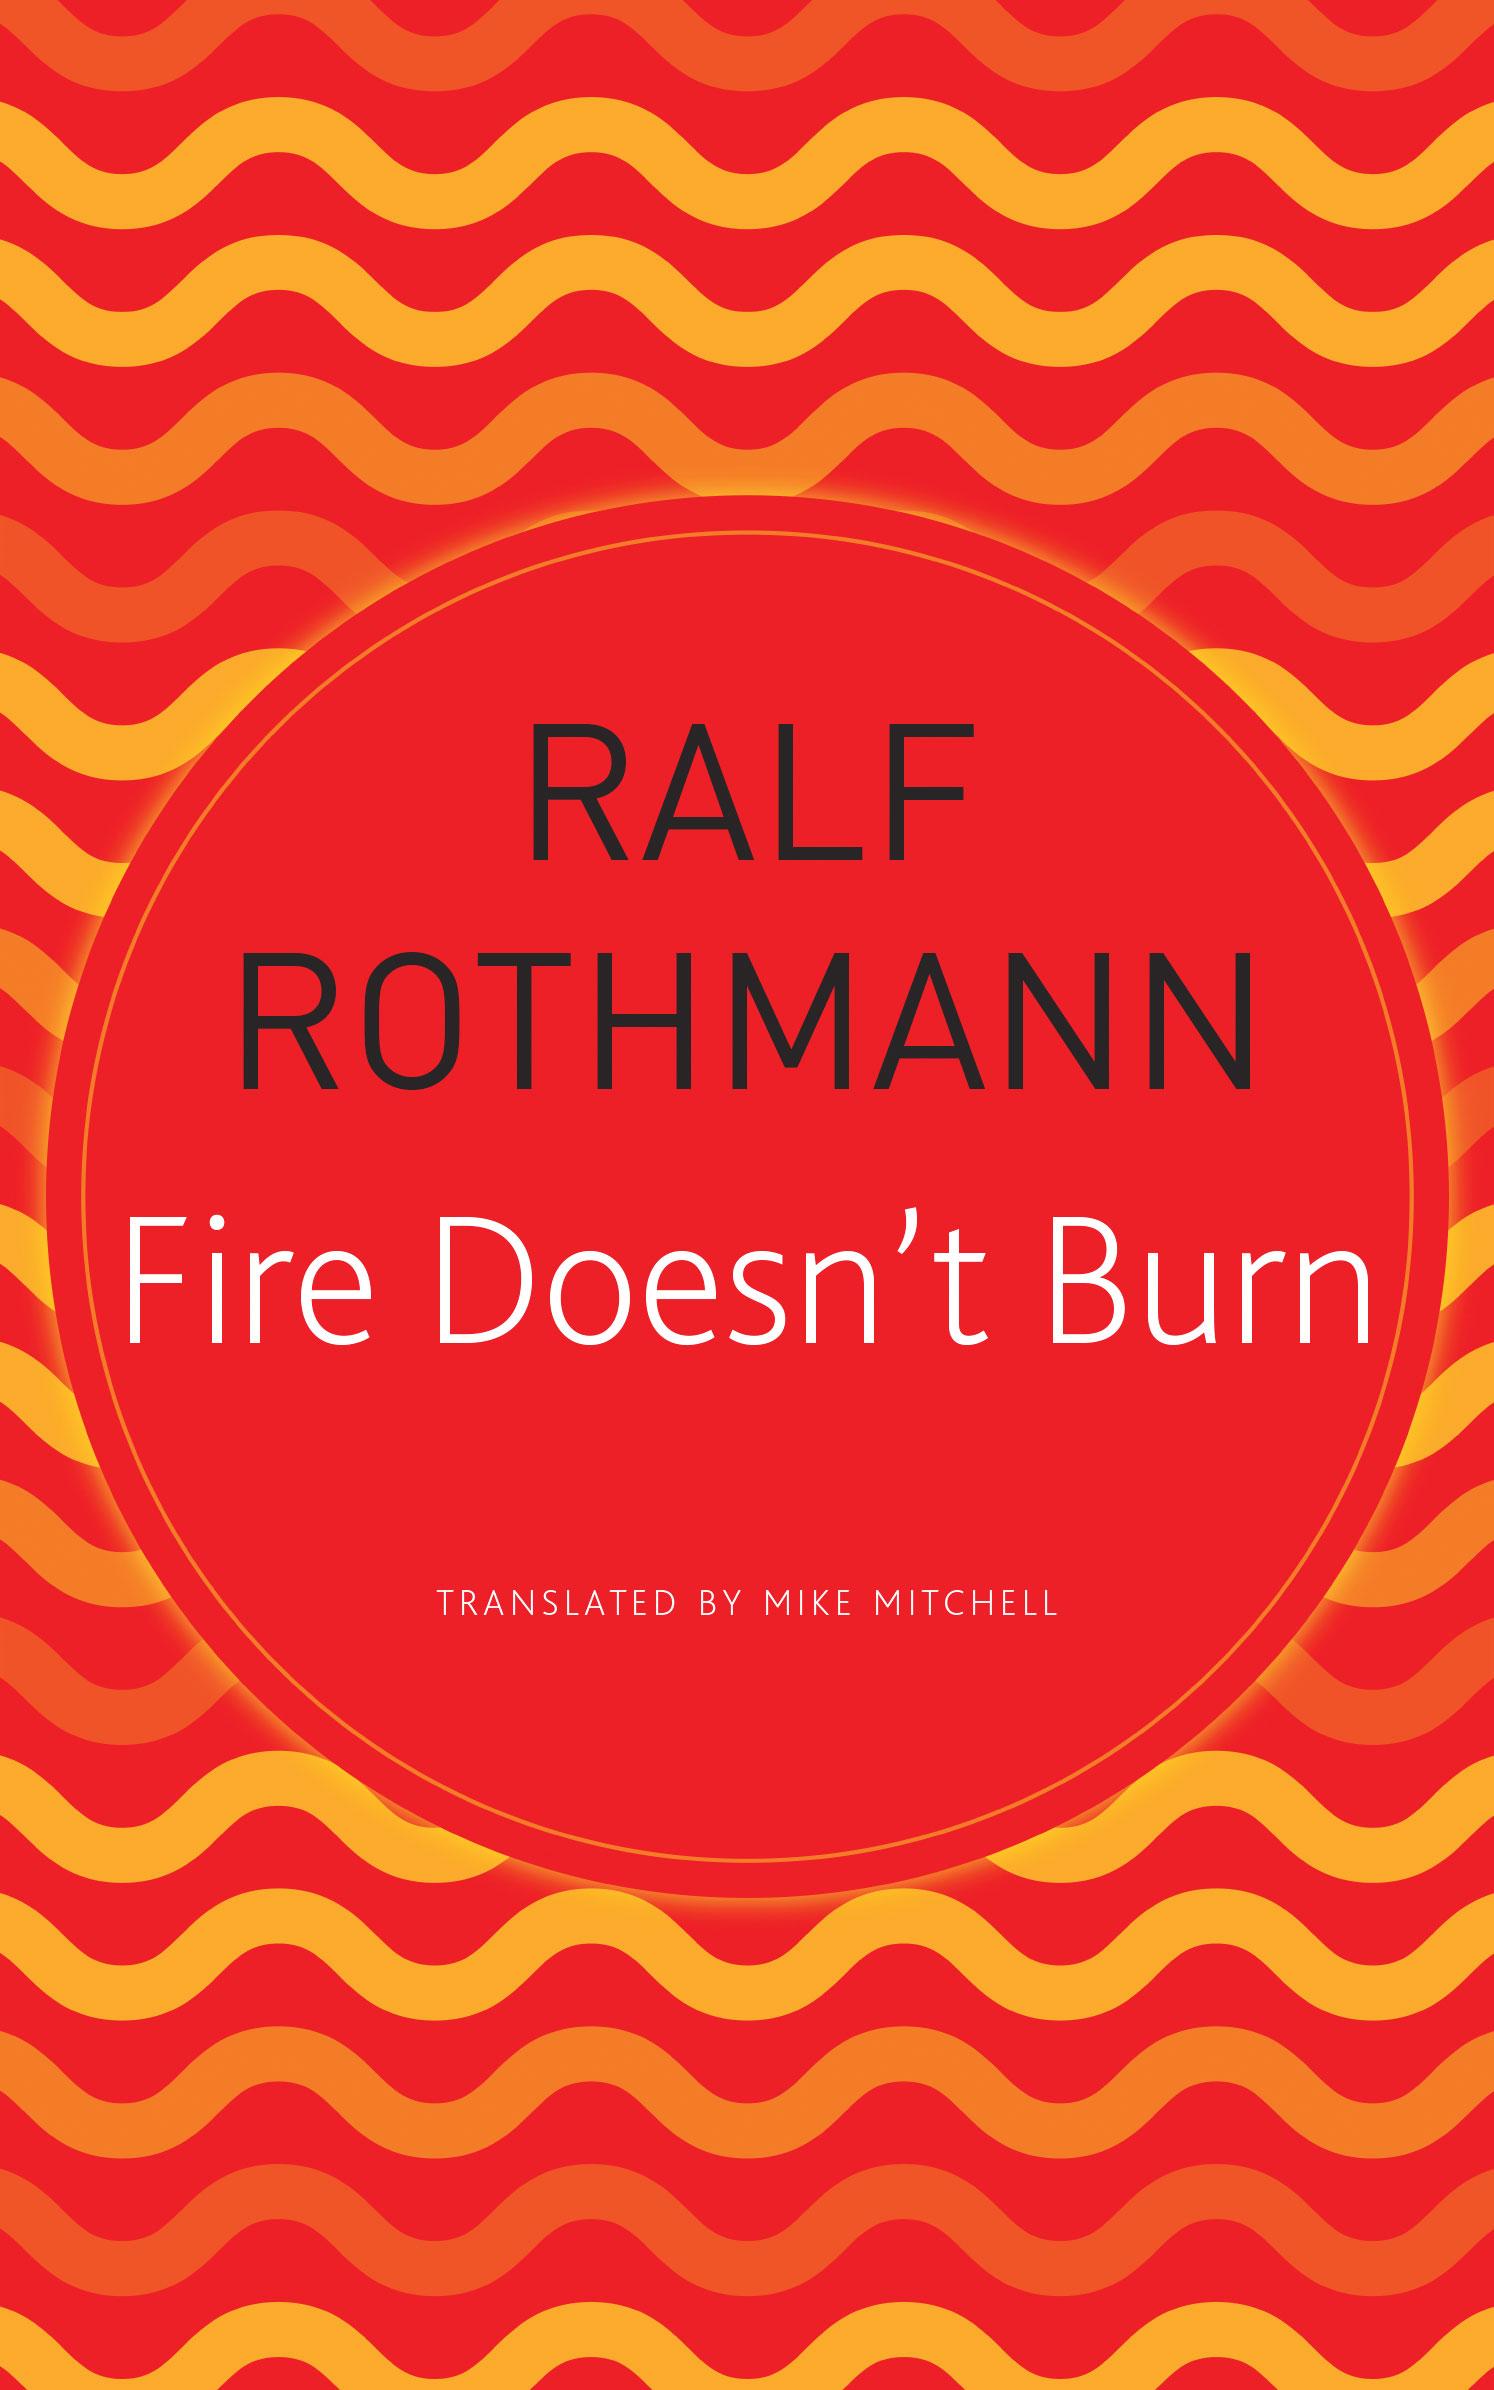 Fire Doesn't Burn by Ralf Rothmann | Seagull Books